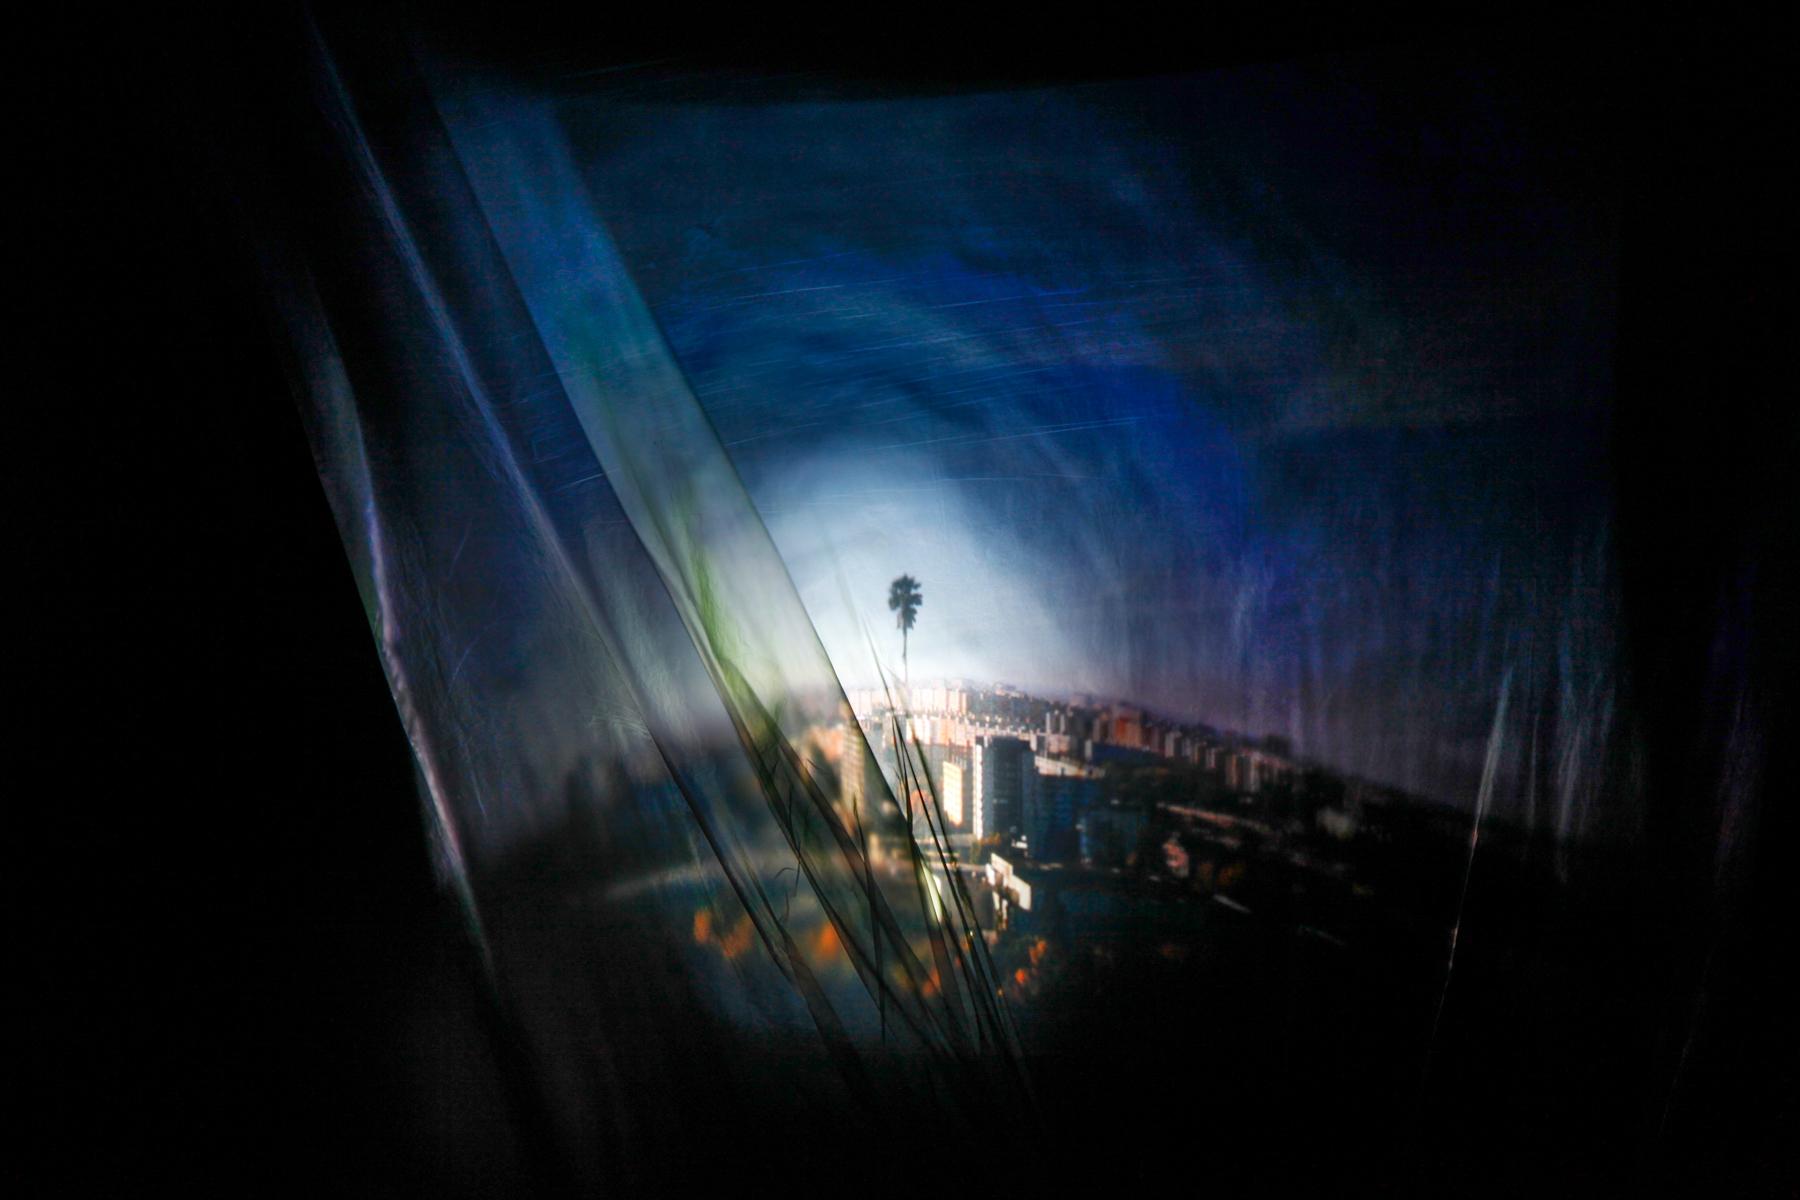 ELENA GERTHOFEROVA_prjekce fiktivniho obrazu na dve vrstvy folie_moznost zaostrit obraz dotikem + instalace fotografii 2